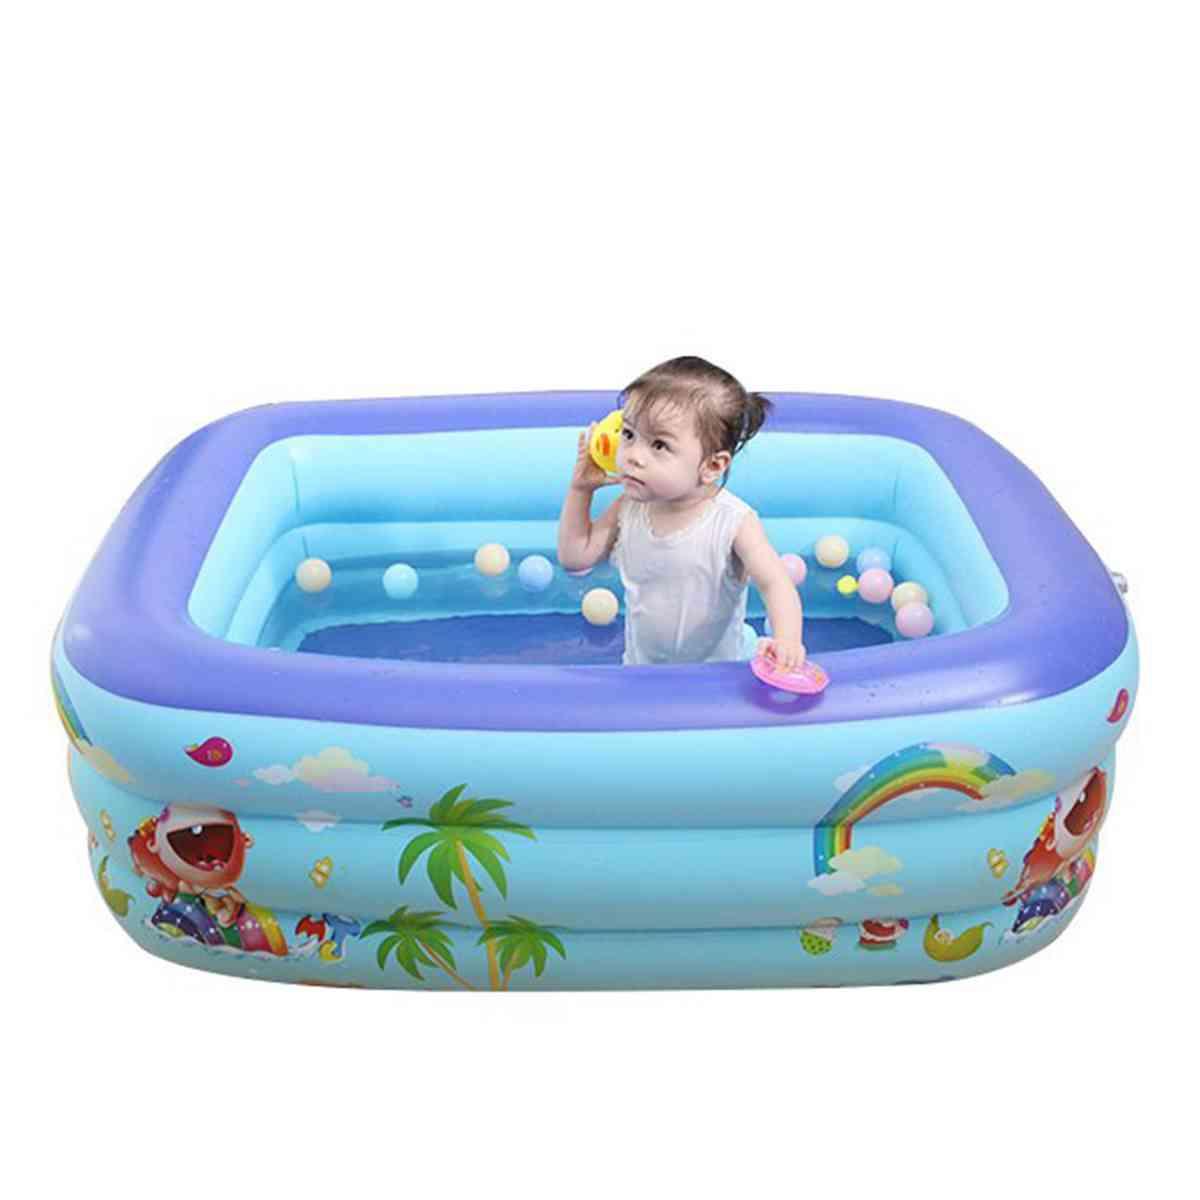 120/130150cm Inflatable Swimming Pool - Baby Bathing Tub